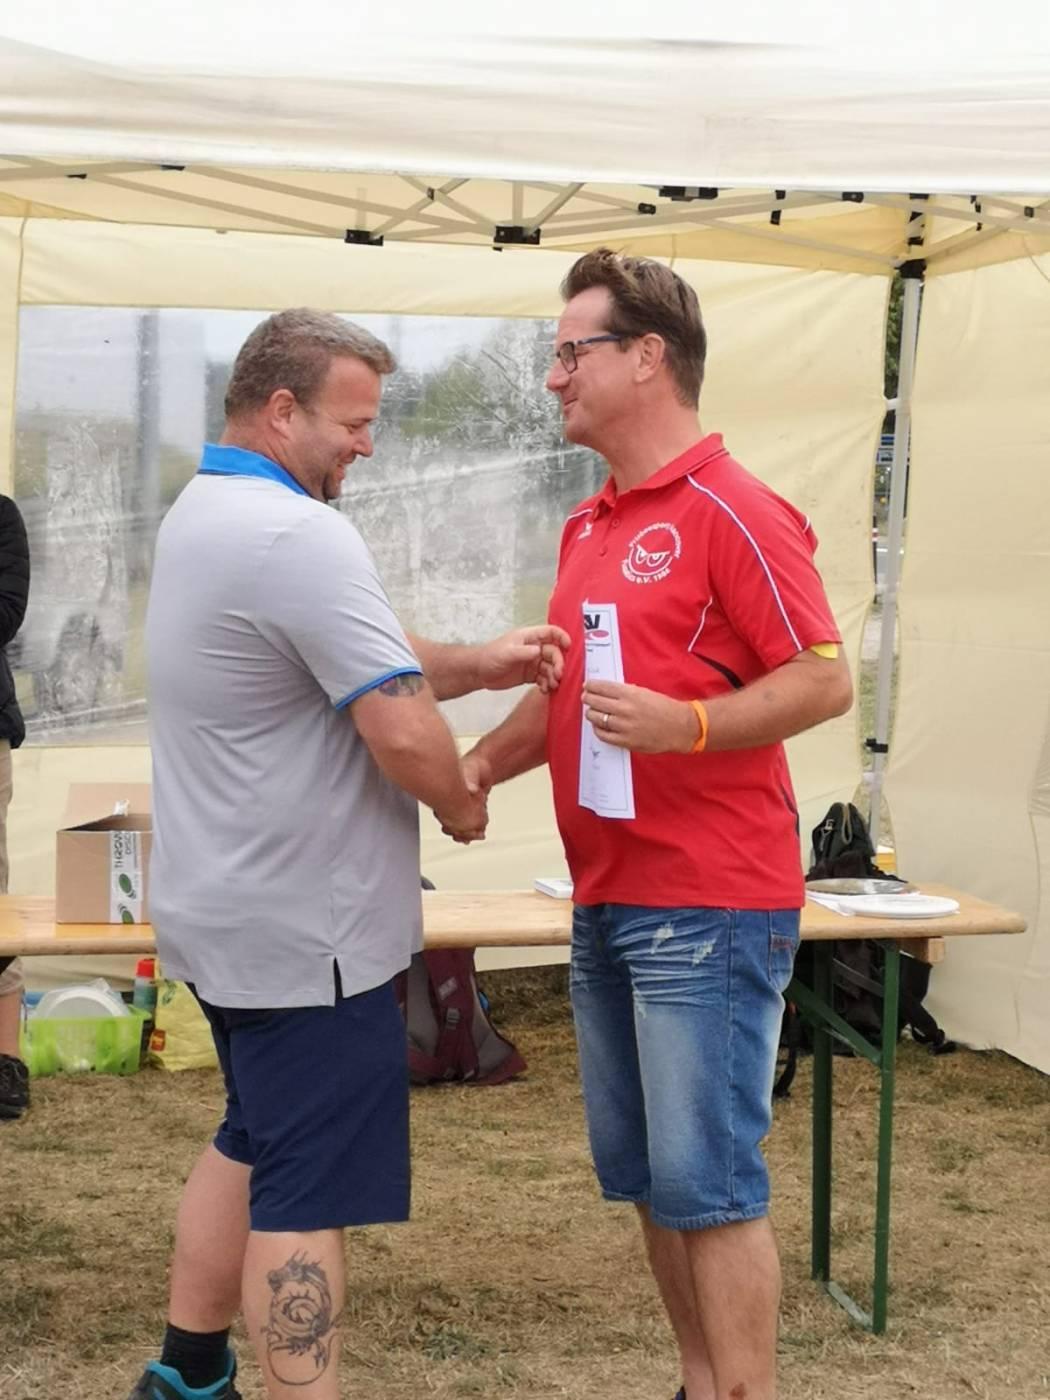 2018-09-02_NDS Landesmeisterschaft Discgolf Hannover 2018_050